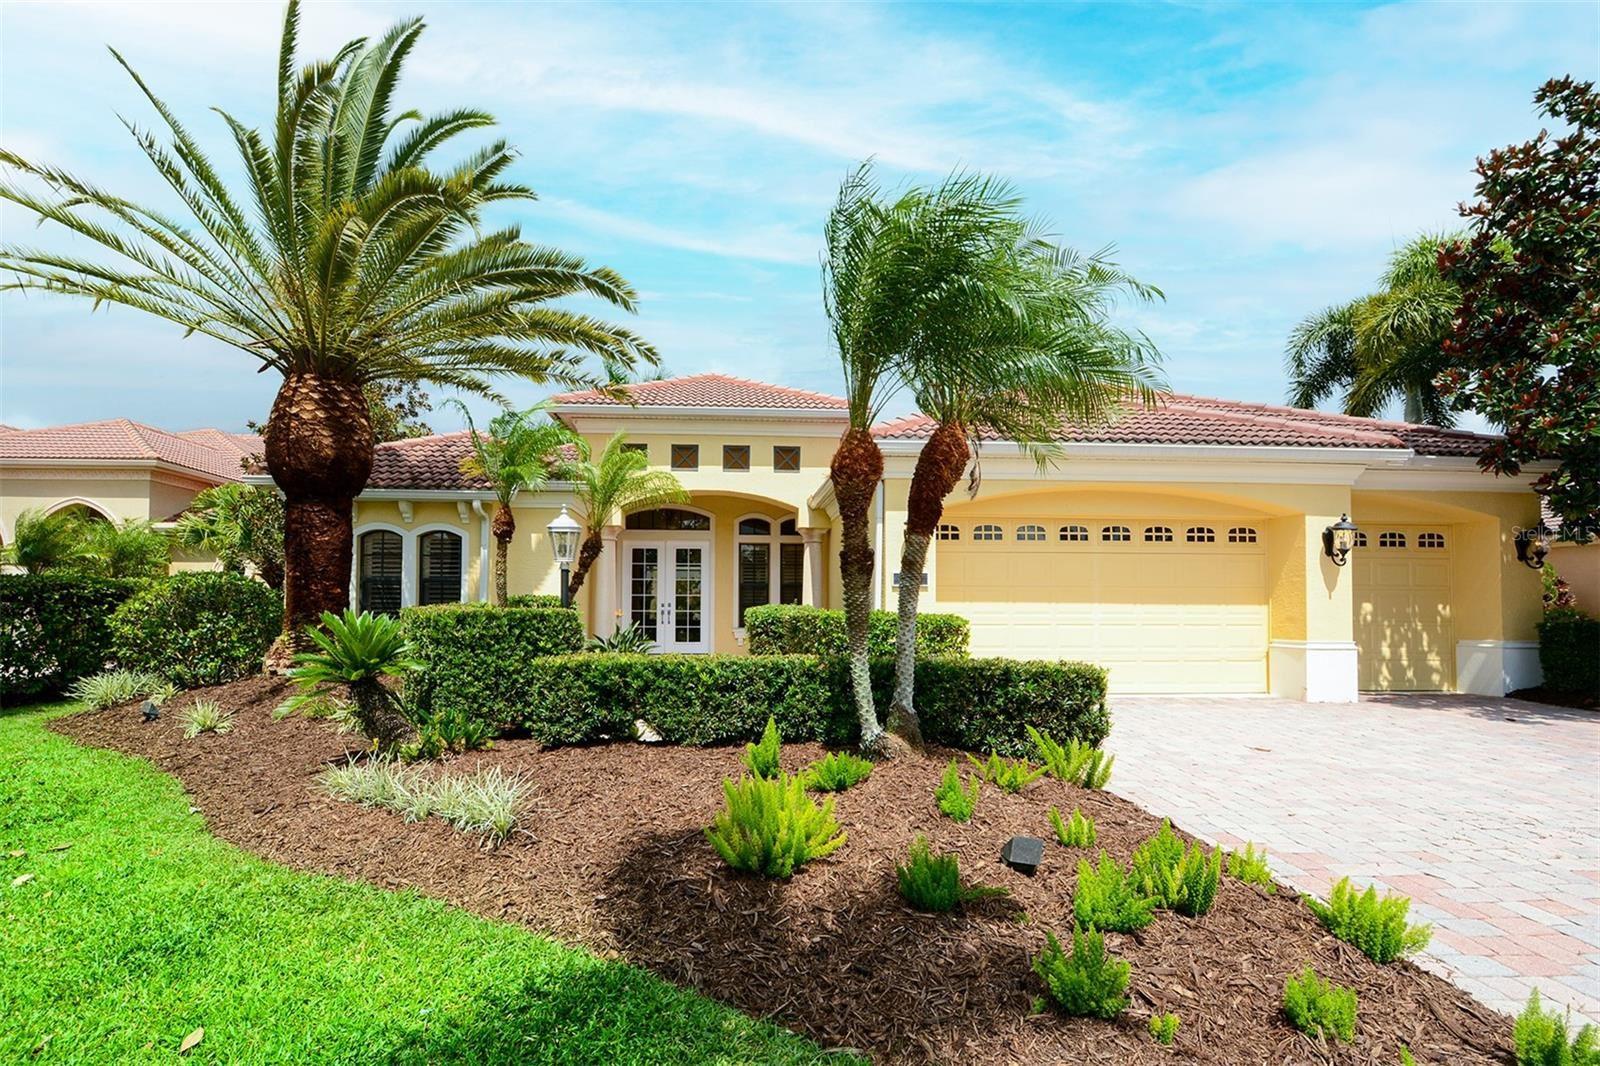 7019 BRIER CREEK COURT, Lakewood Ranch, FL 34202 - #: A4511904